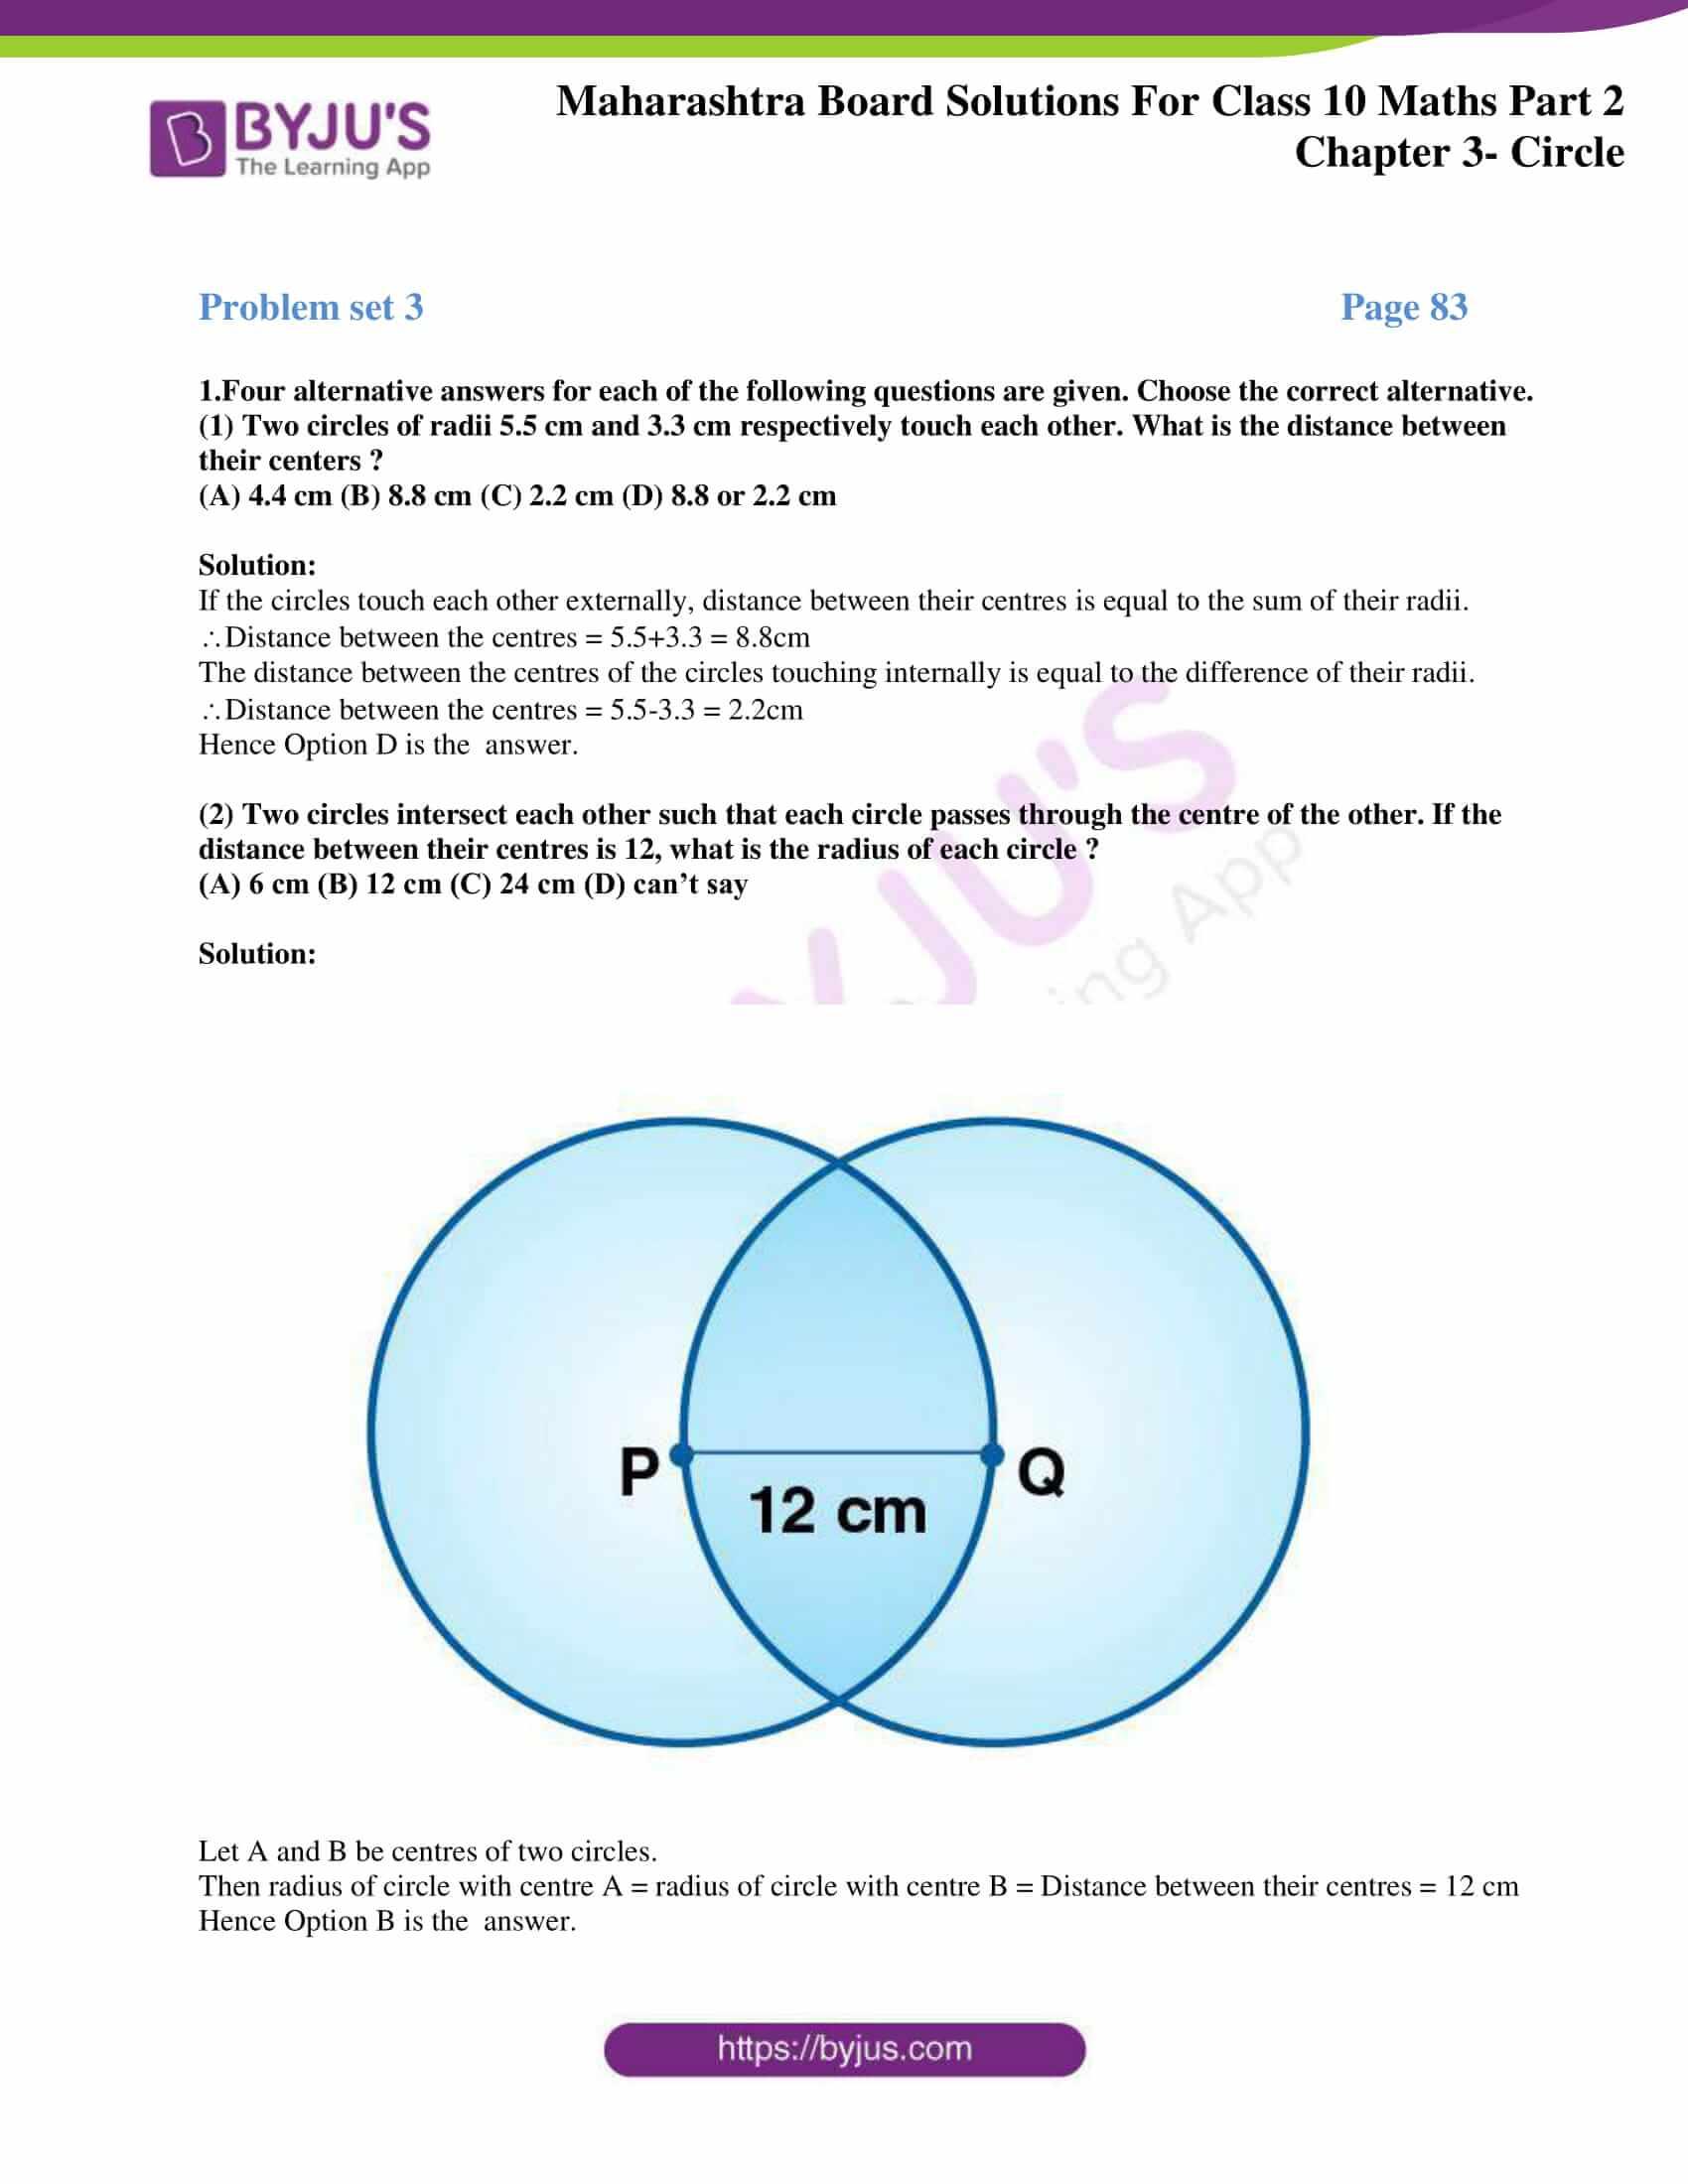 msbshse sol class 10 maths part 2 chapter 3 17